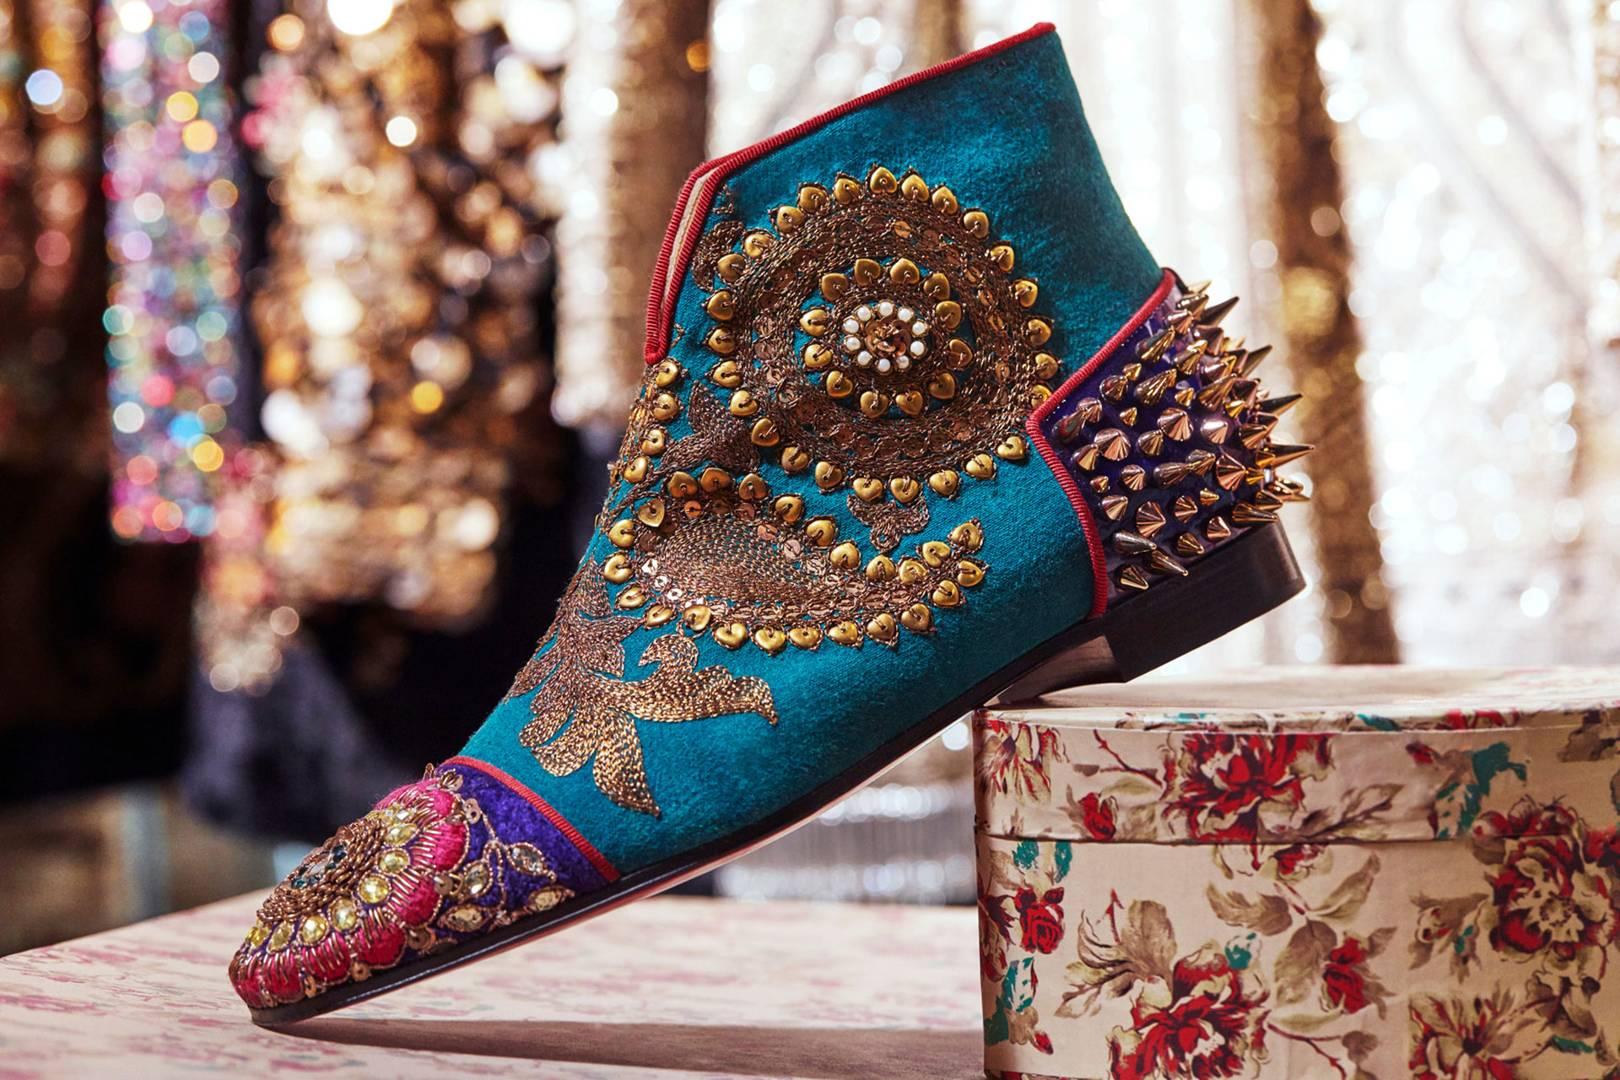 58c8f005ec40 Christian Louboutin Shoe Footwear Collaboration Sabyasachi Mukherjee ...